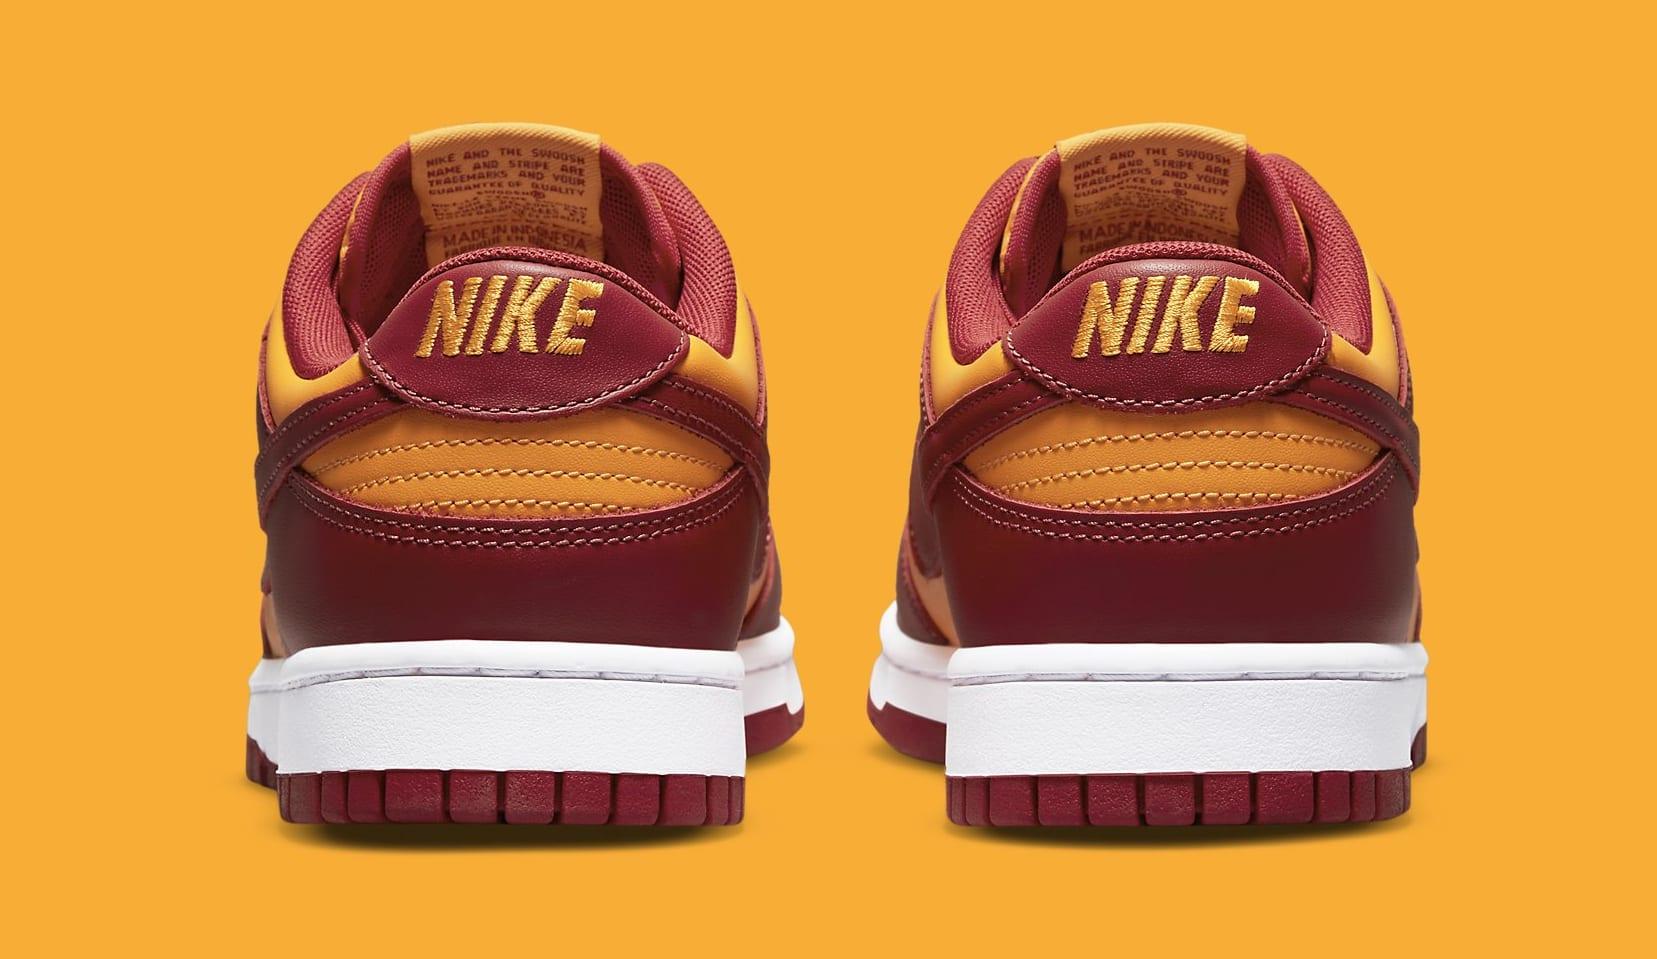 Nike Dunk Low 'Midas Gold' DD1391-701 Heel